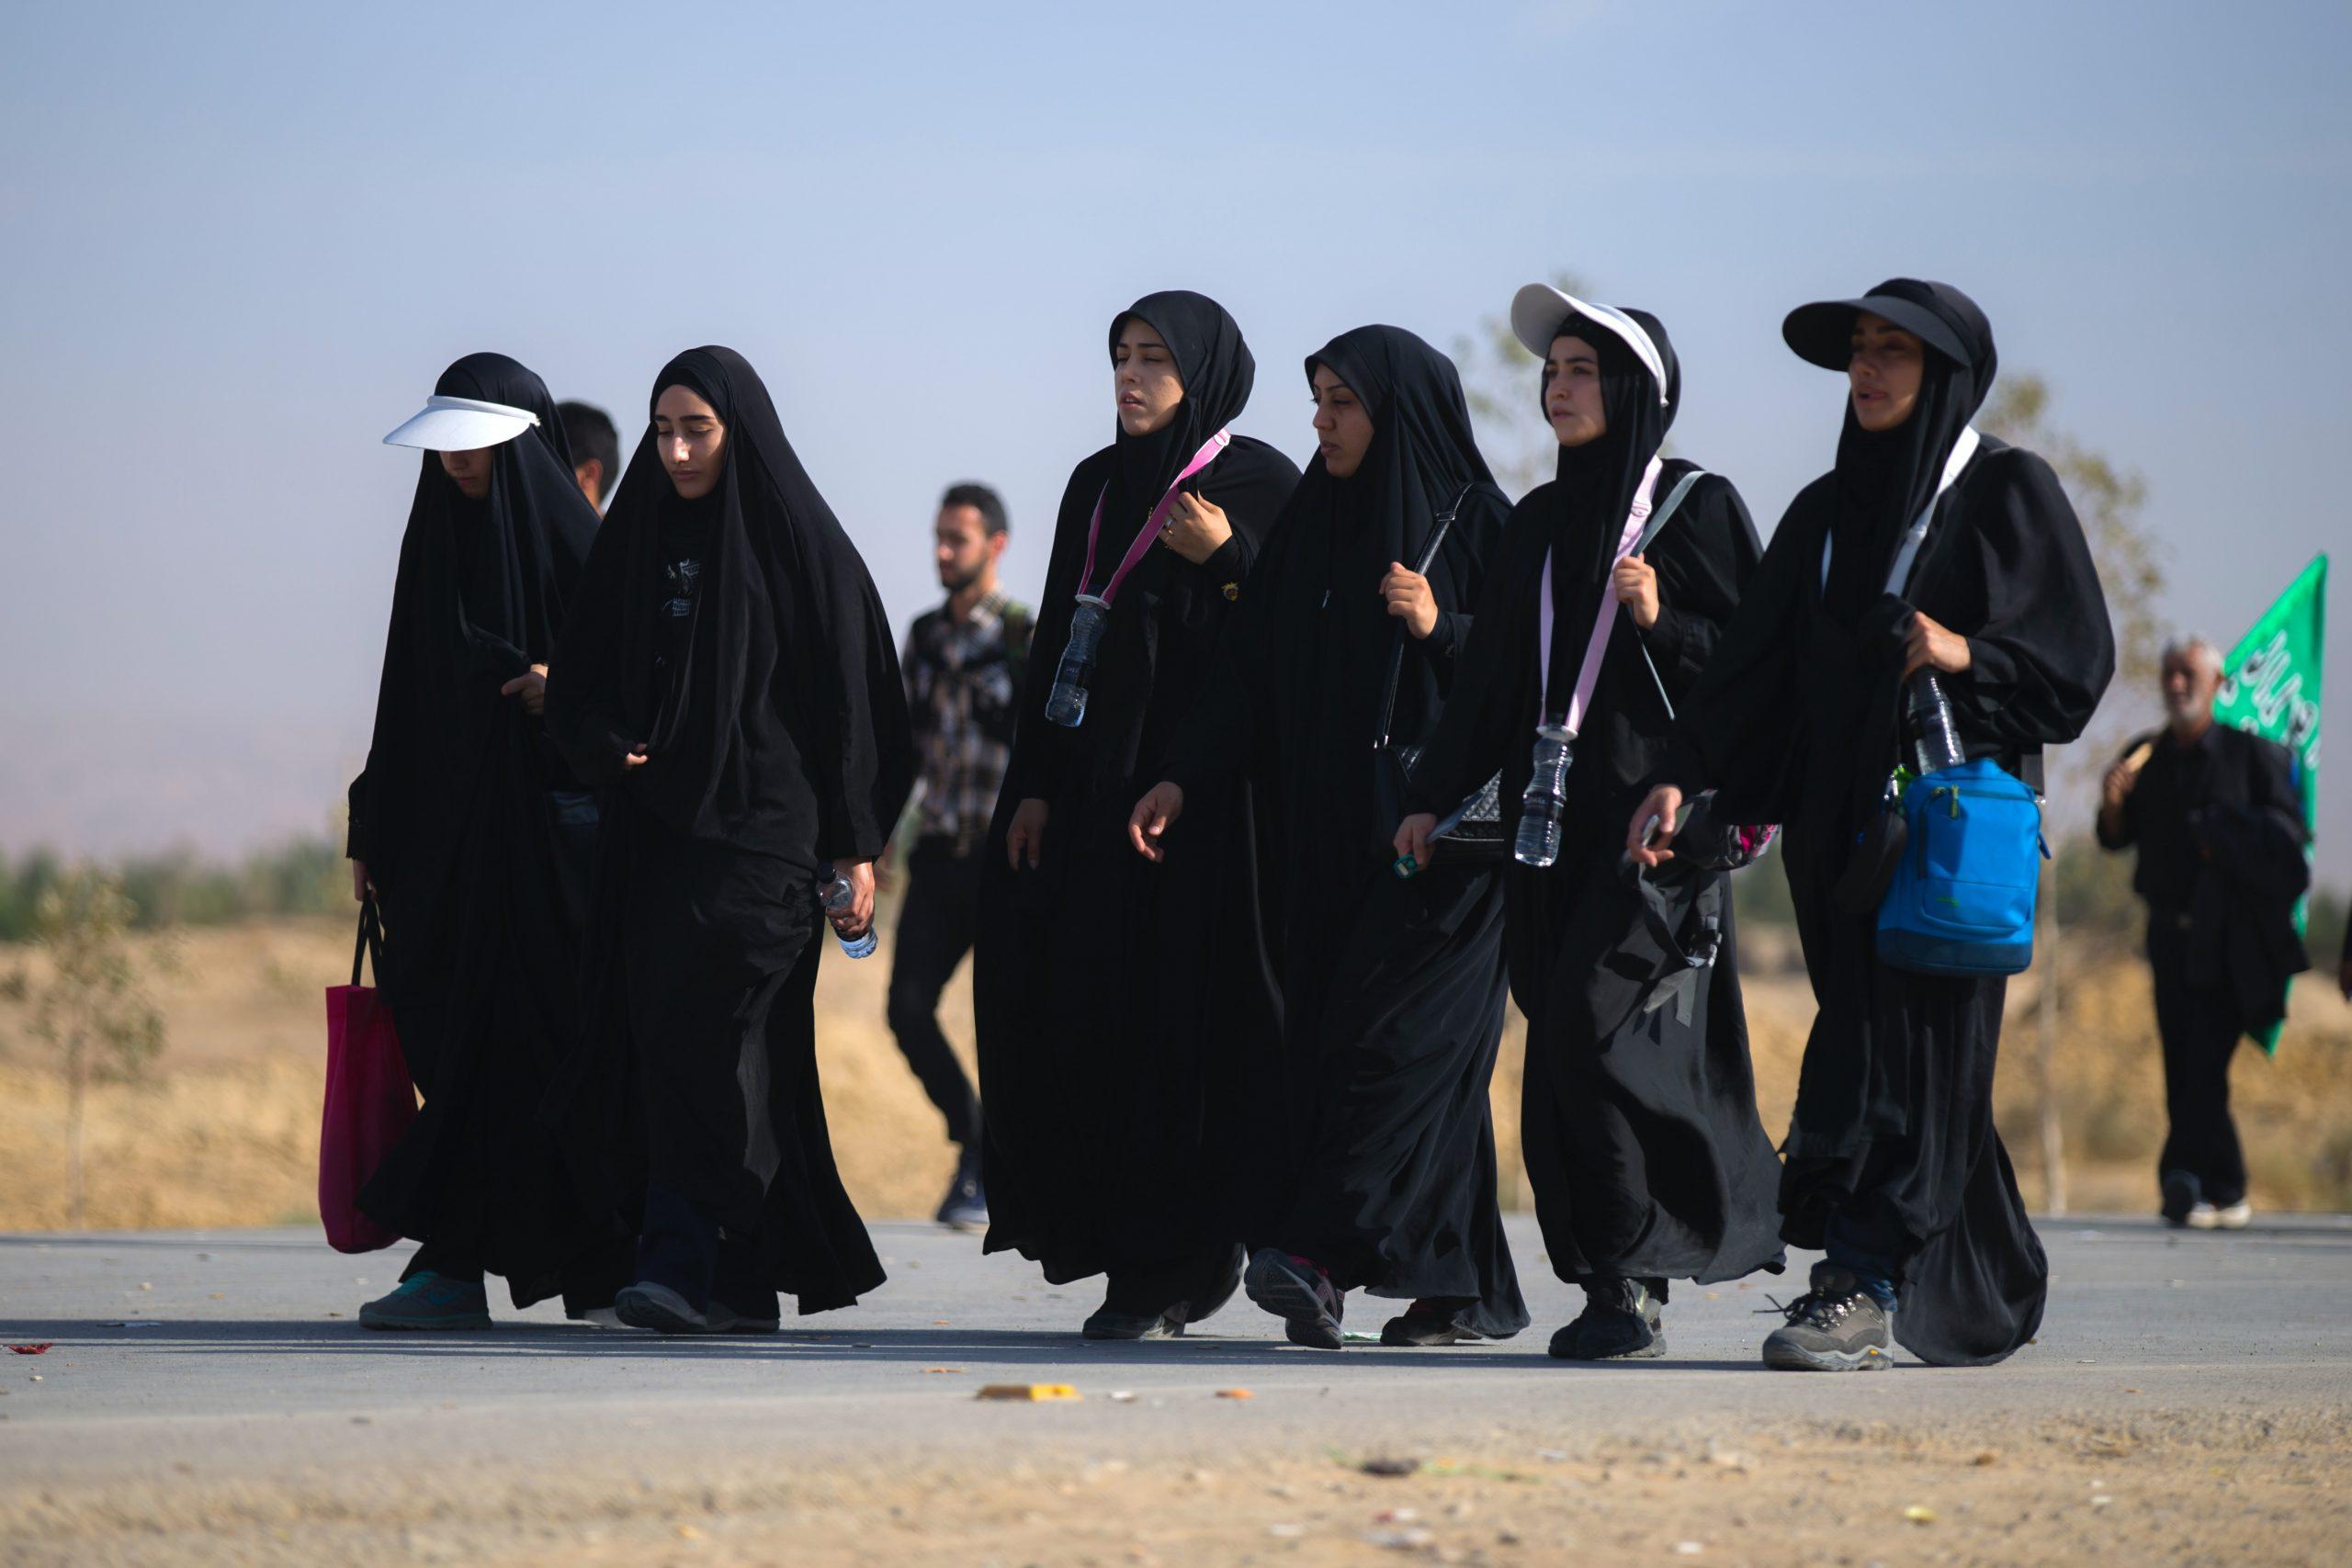 Nasehat Islami Kemuliaan Memuliakan Tamu